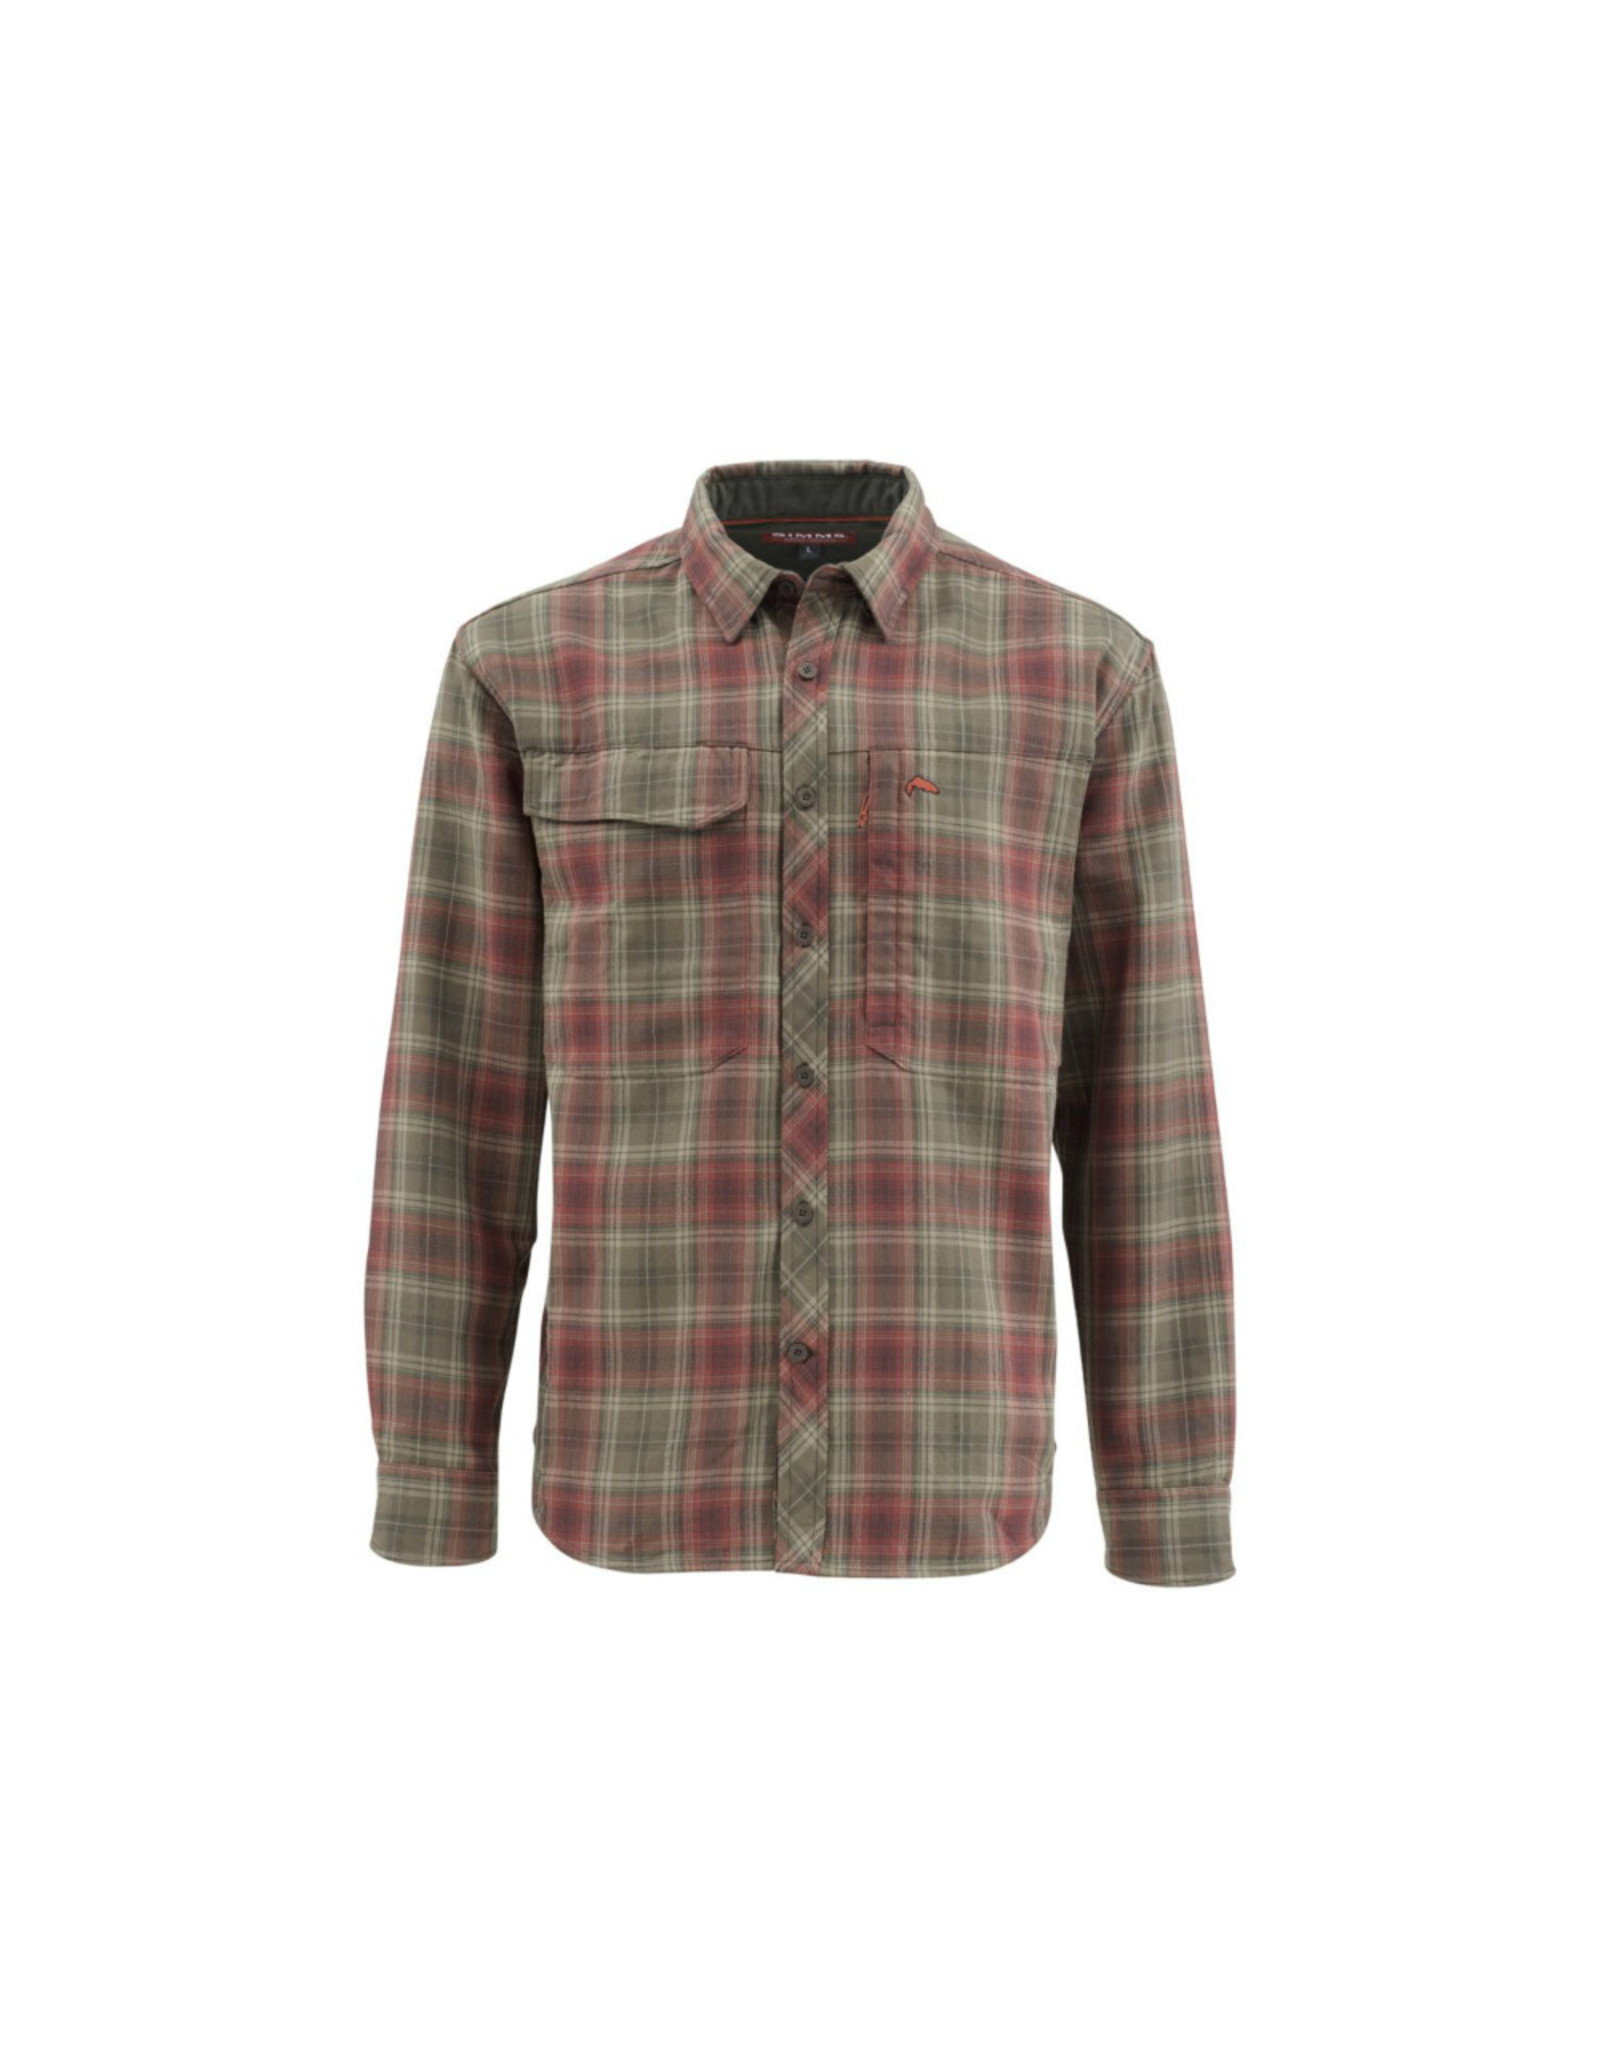 Simms Simms - Guide Flannel Long Sleeve Shirt